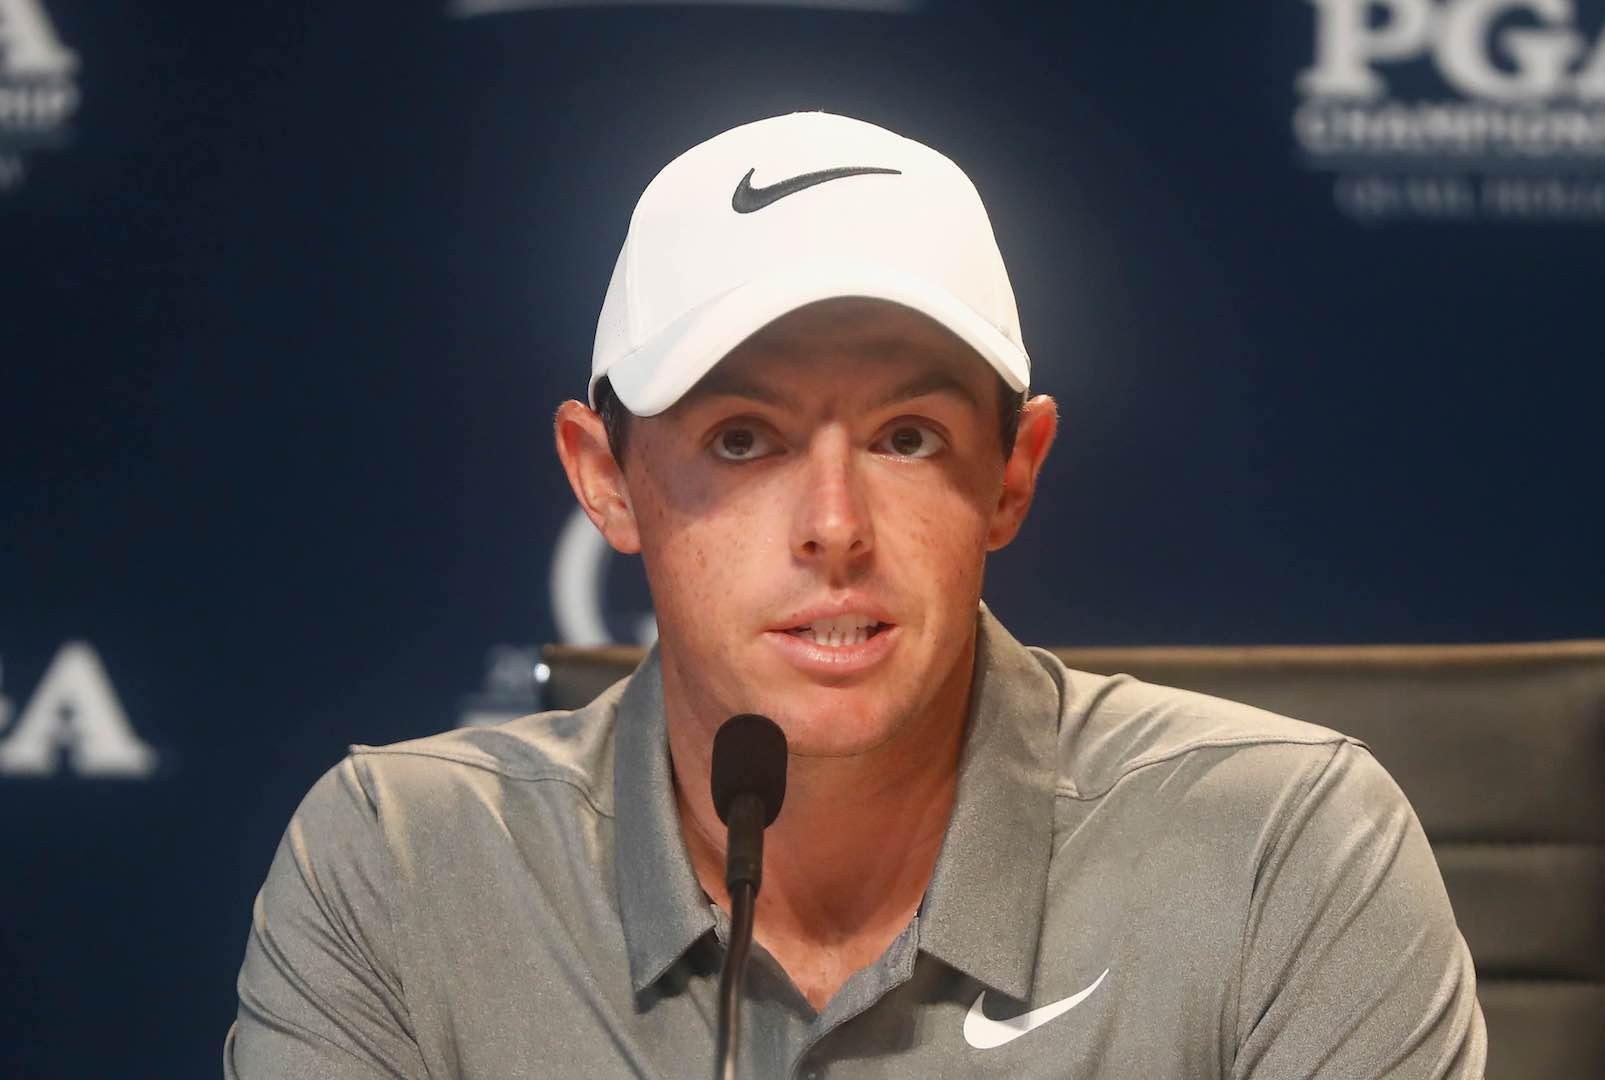 Rory McIlroy's $10 million challenge